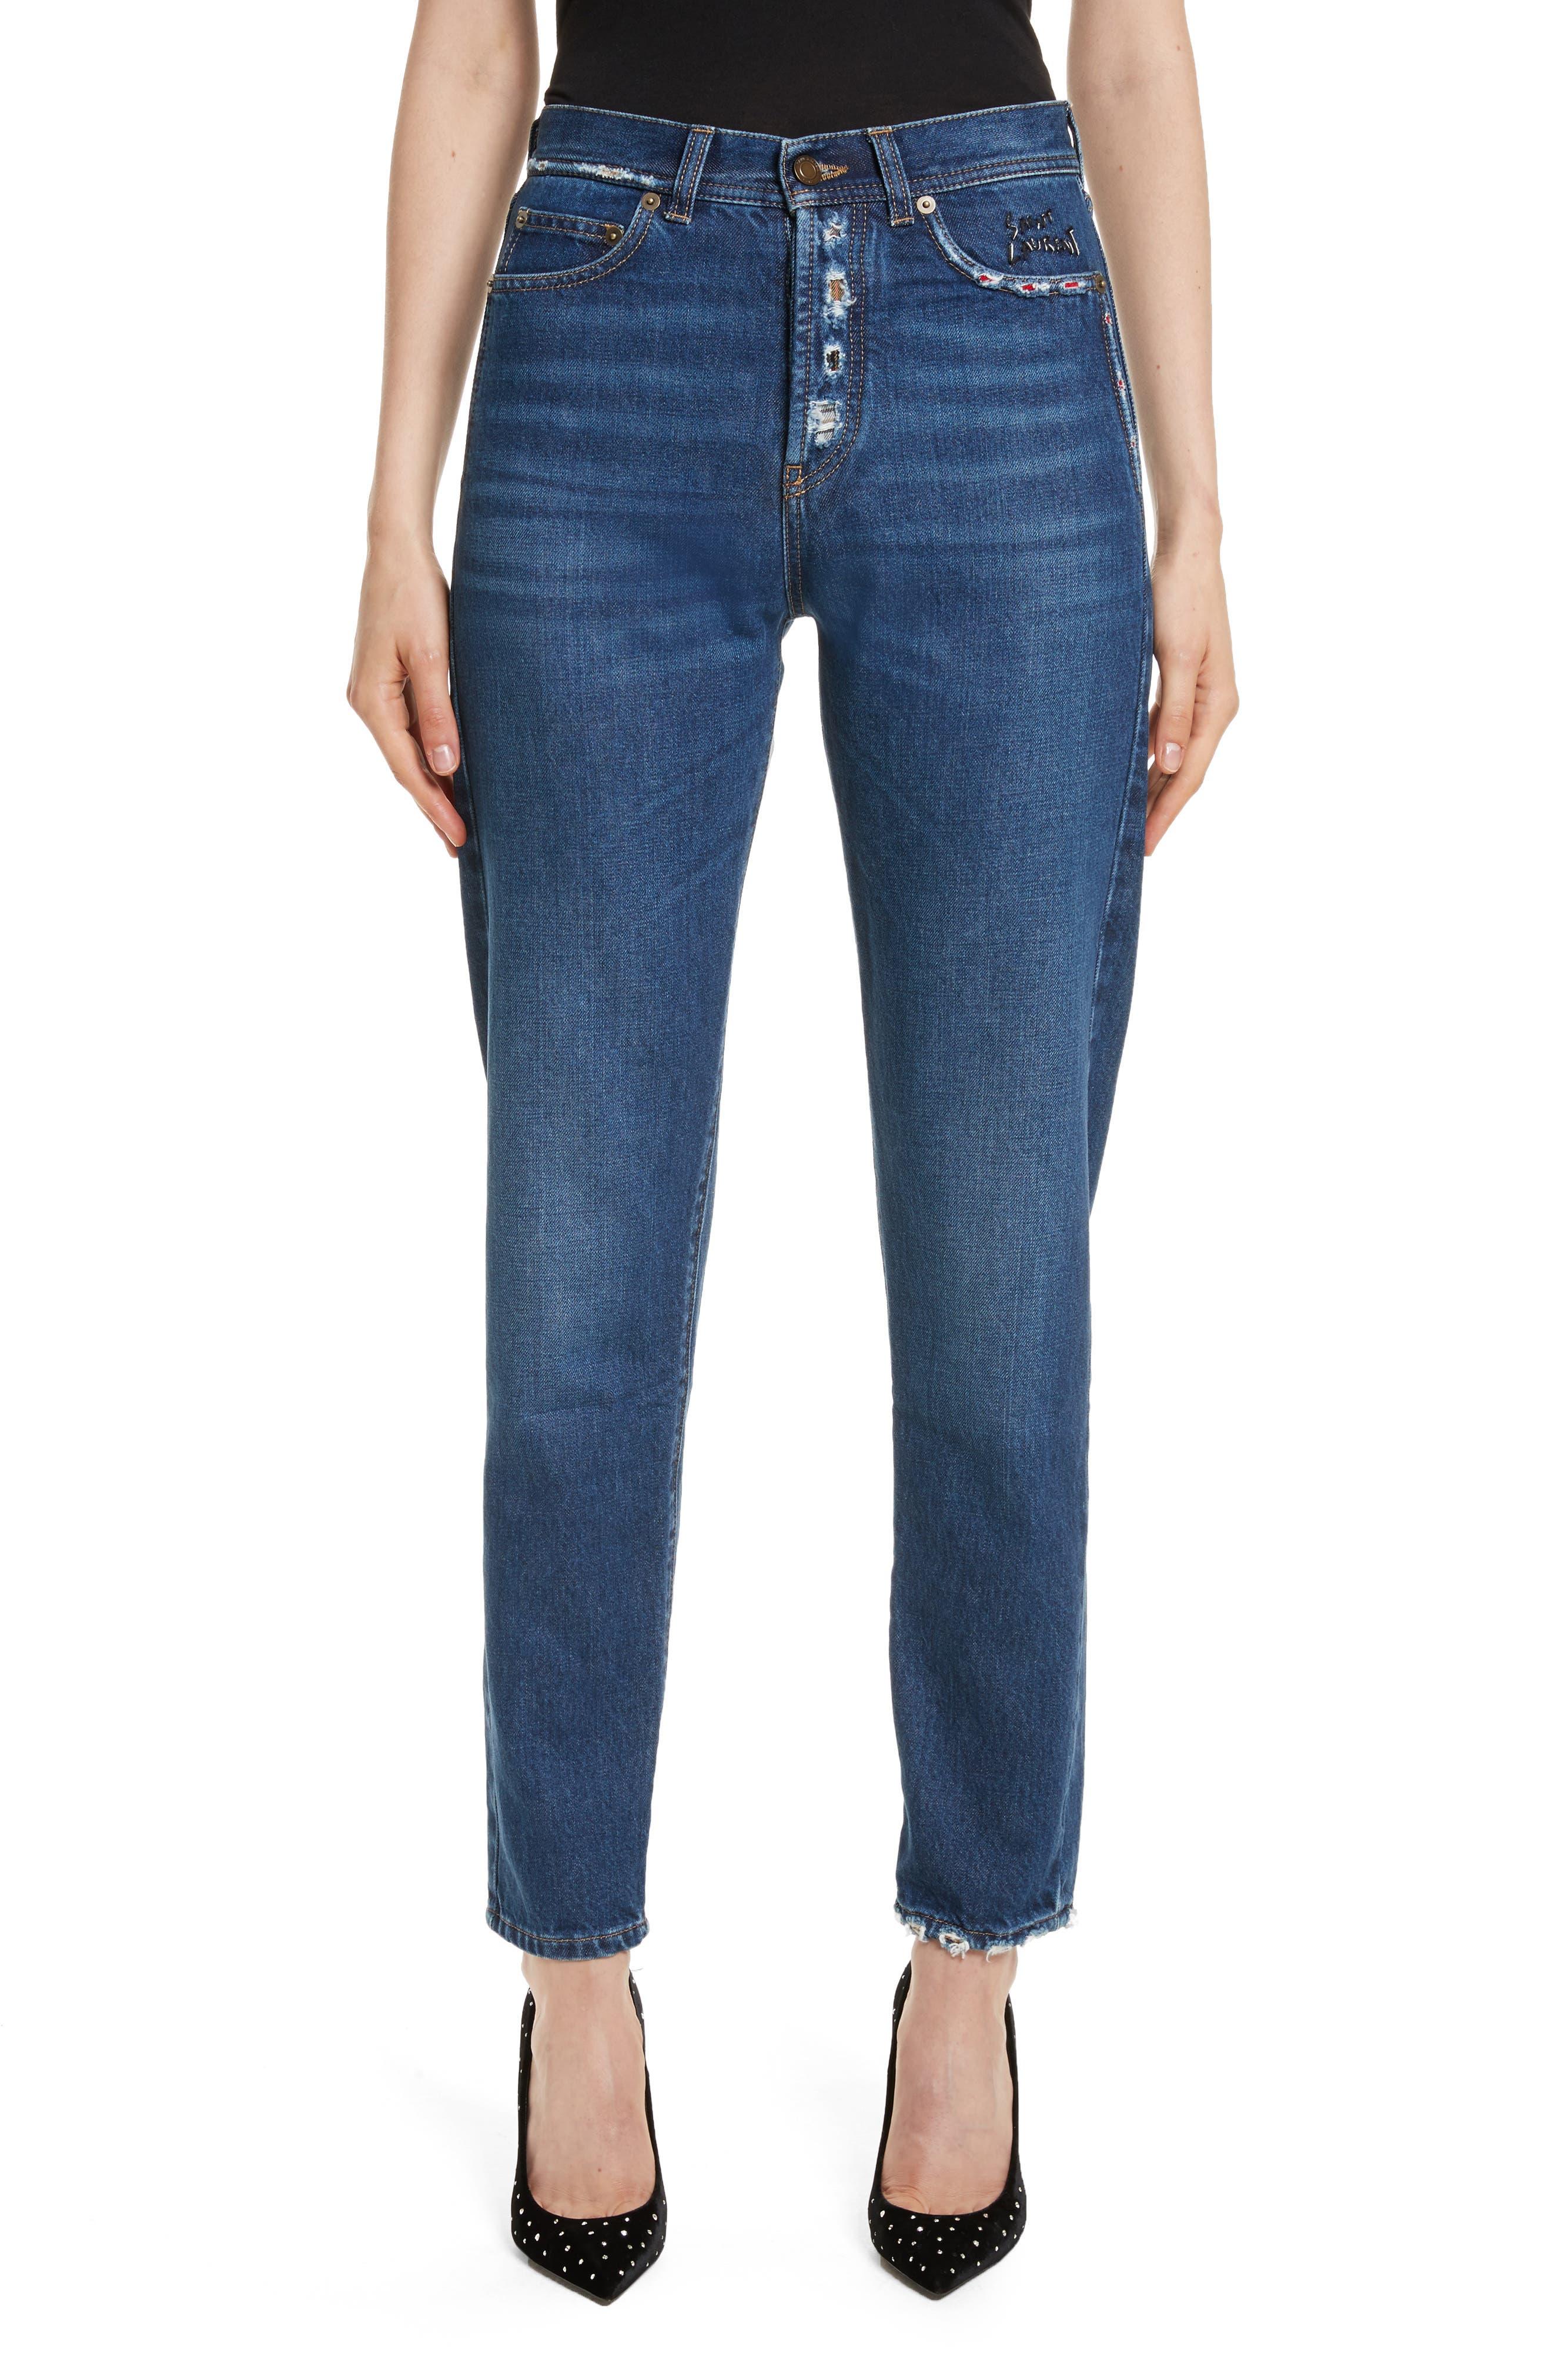 Alternate Image 1 Selected - Saint Laurent Embroidered Jeans (Deep Dark Blue)